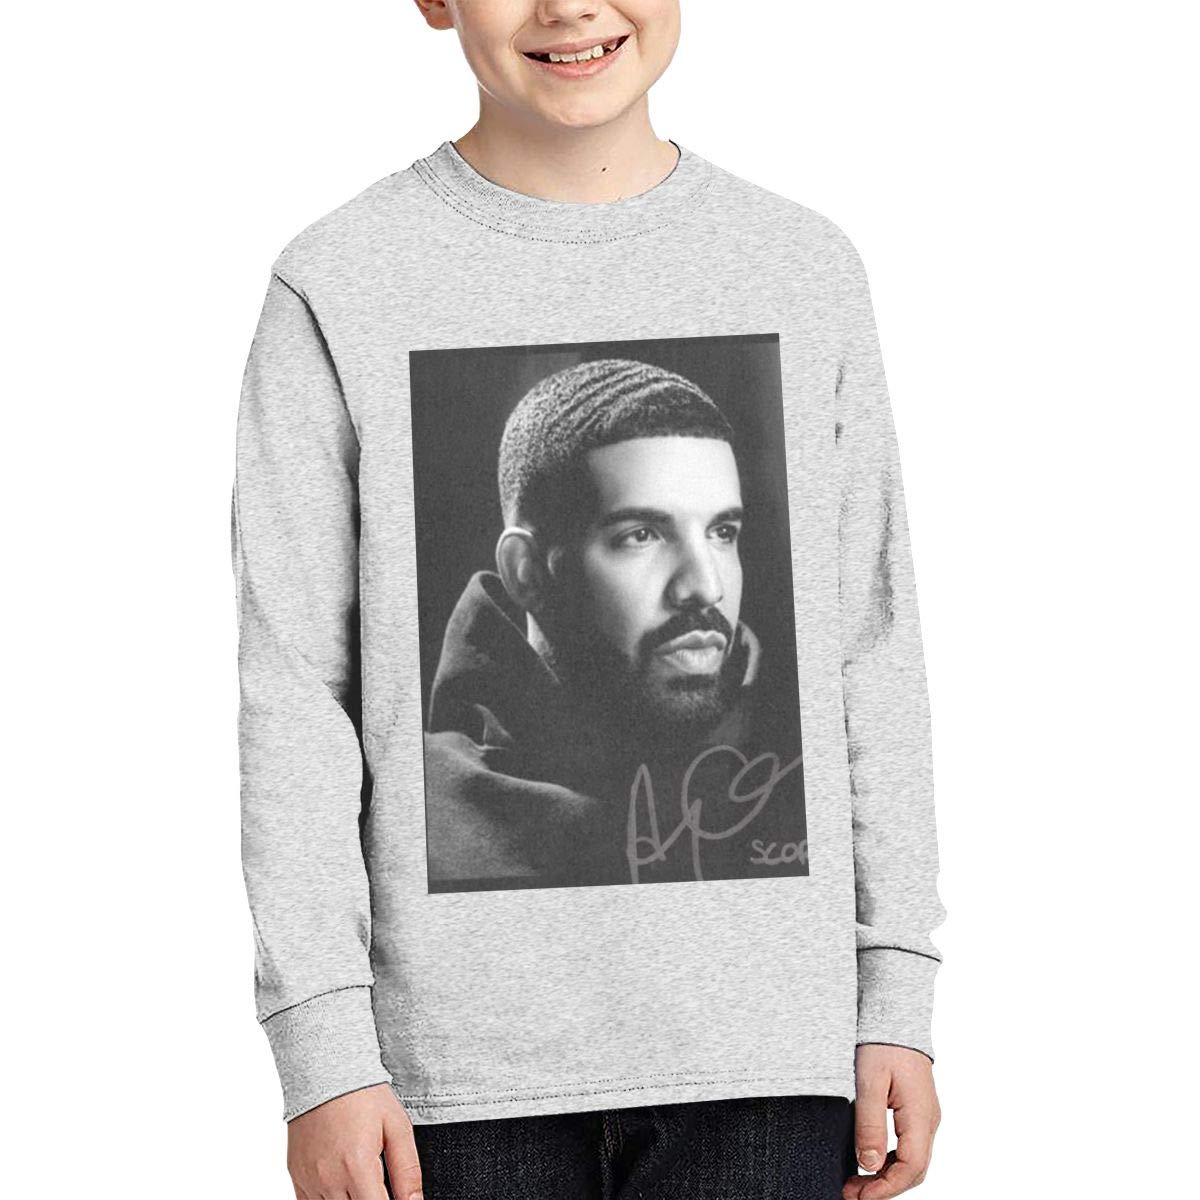 TWOSKILL Youth Old-Drake Long Sleeves Shirt Boys Girls